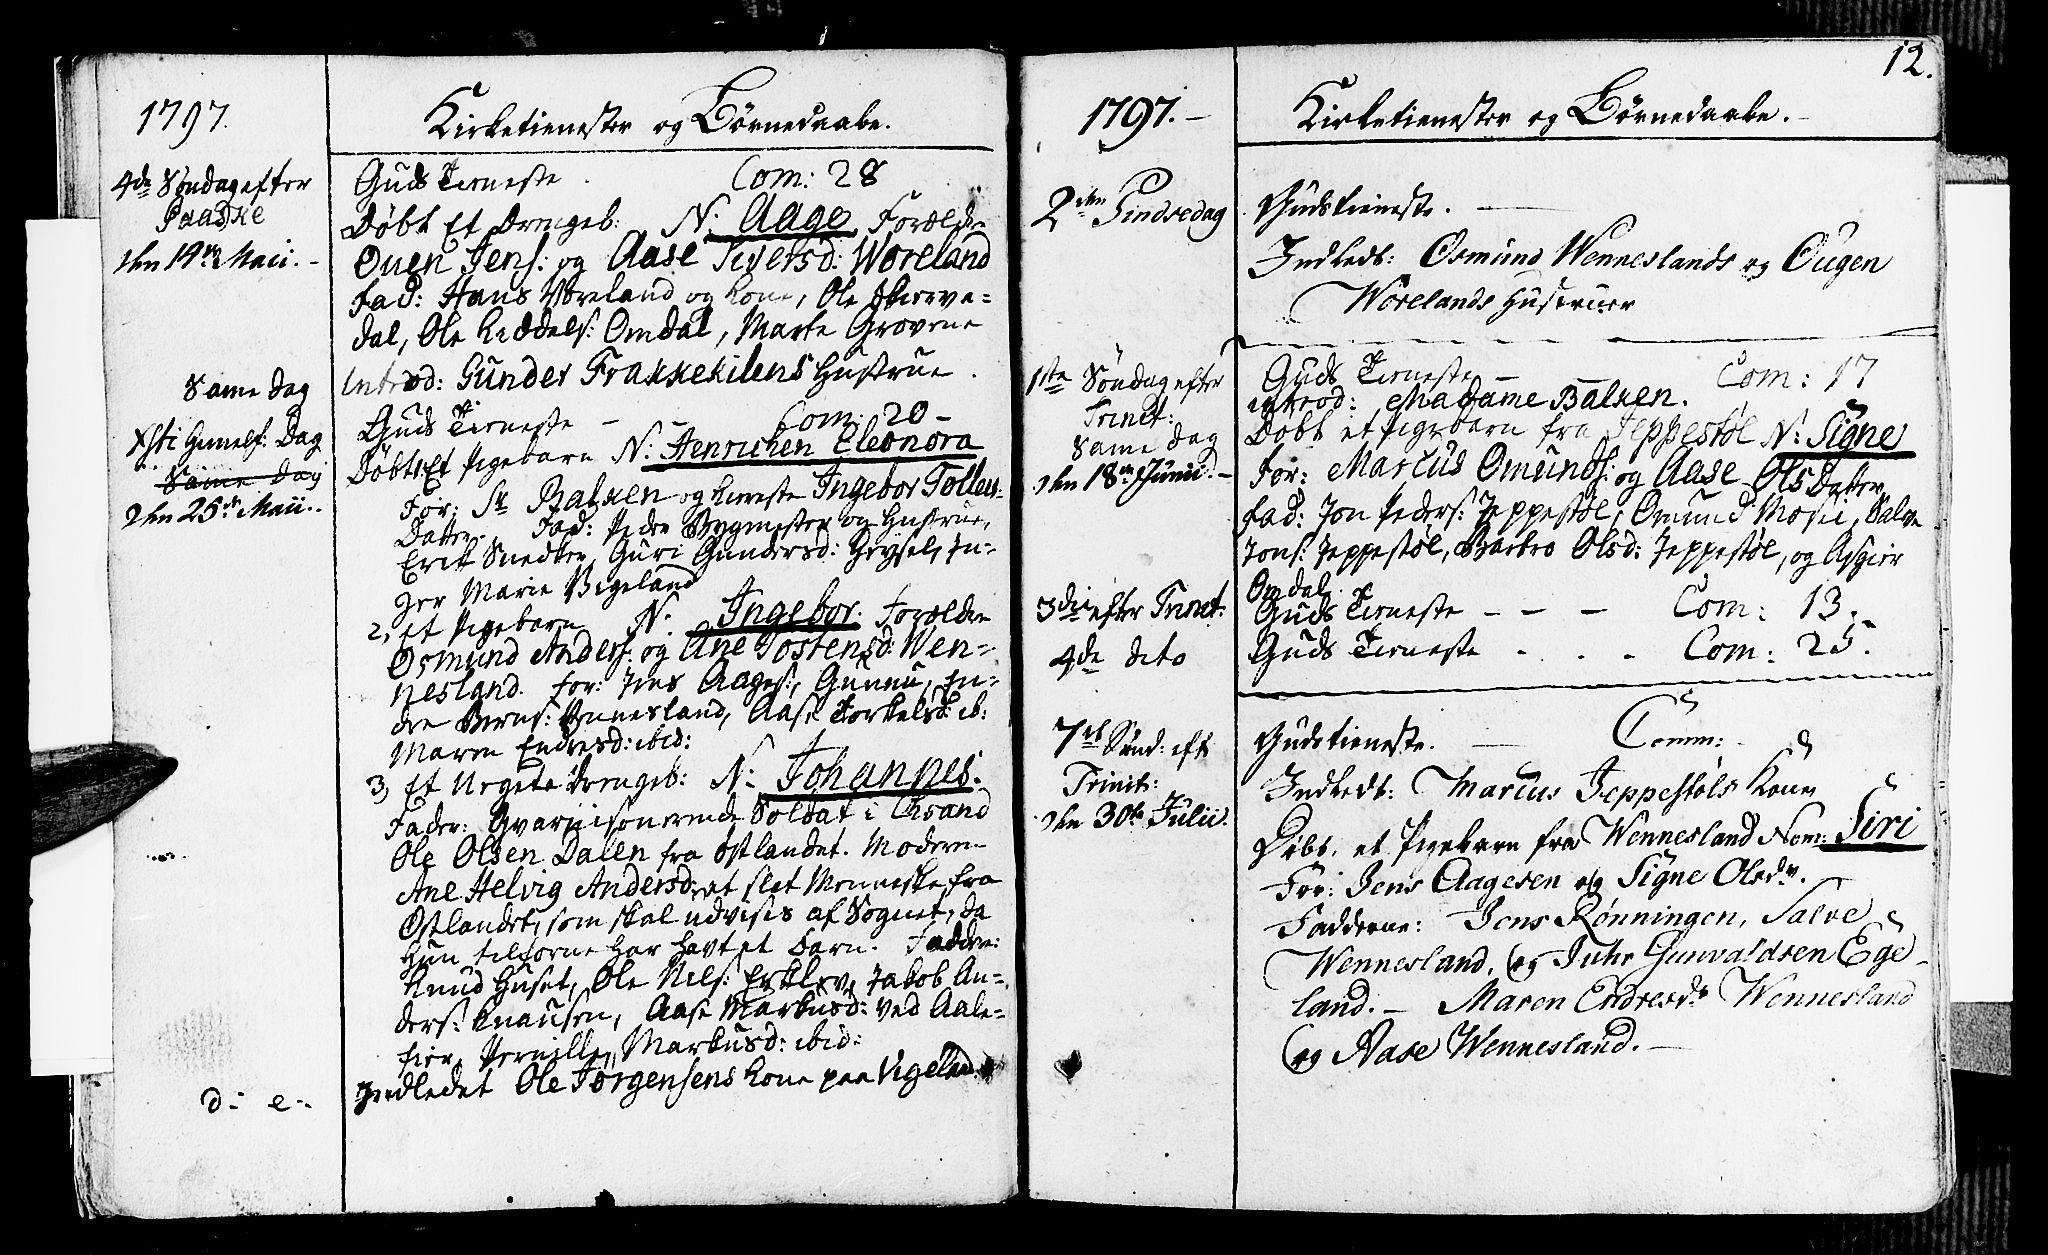 SAK, Vennesla sokneprestkontor, Fa/Fab/L0002: Ministerialbok nr. A 2, 1794-1834, s. 12